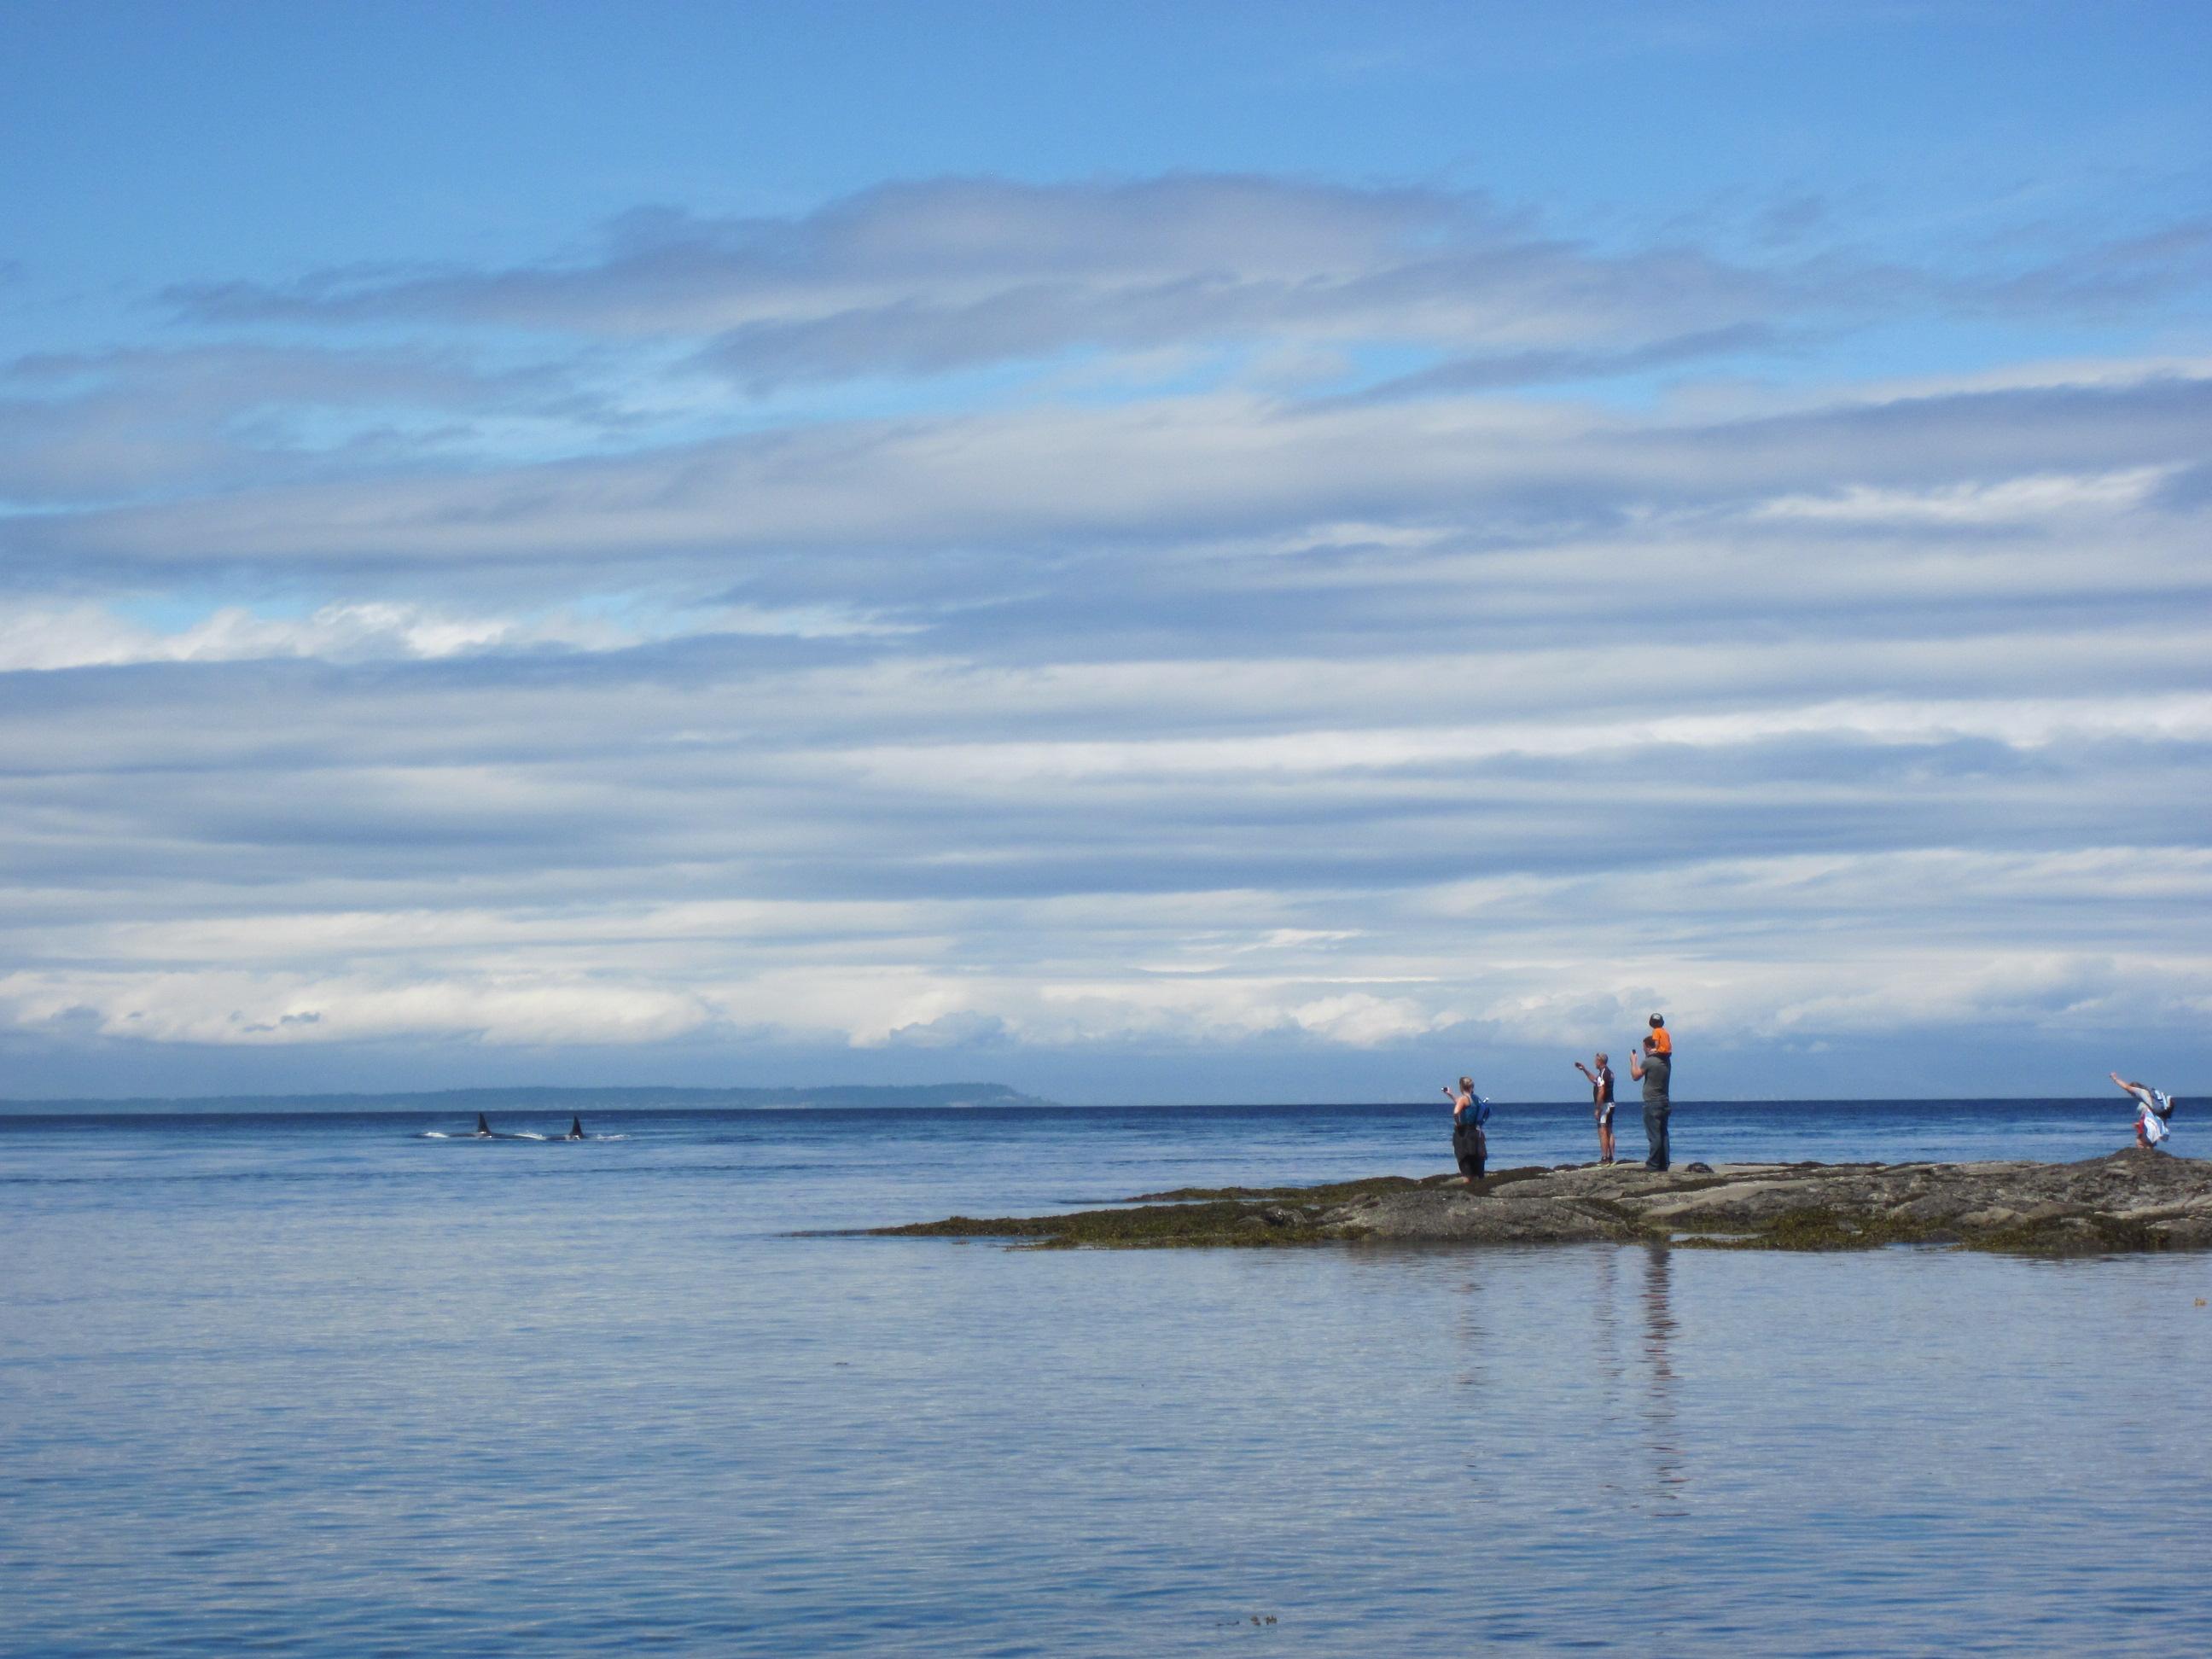 Saturna Island Killer Whales – 19/7/14